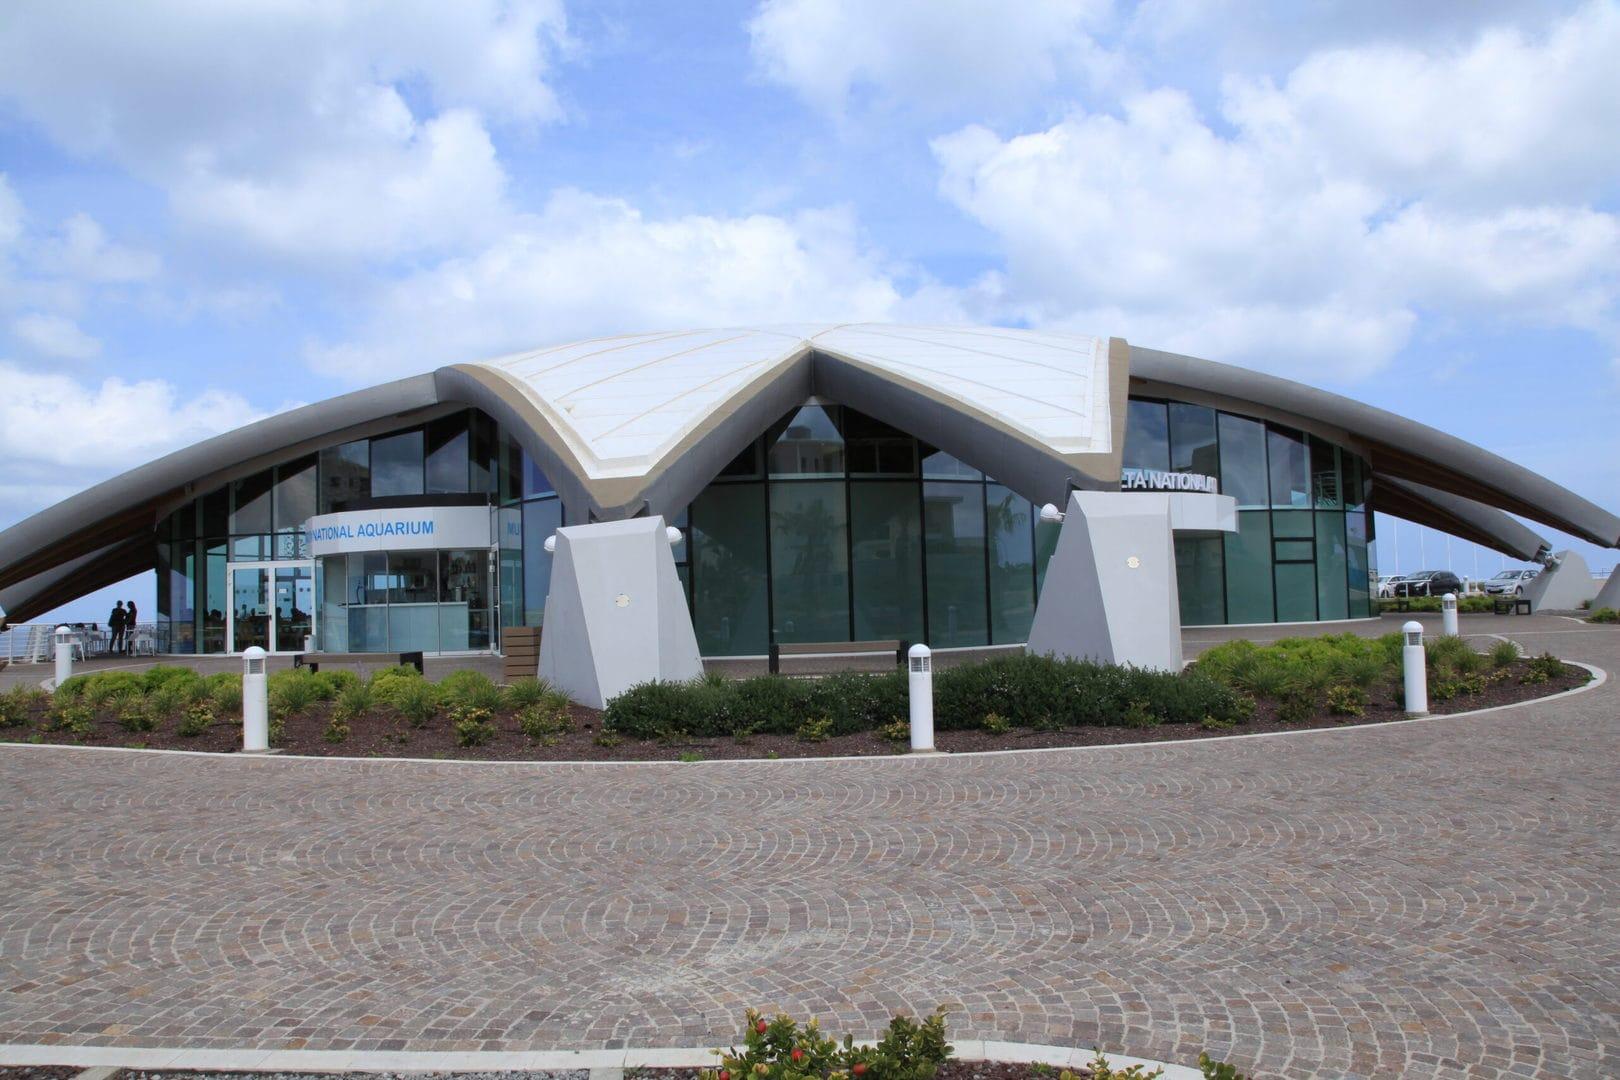 National aquarium-malta-alfatravel-studierejser